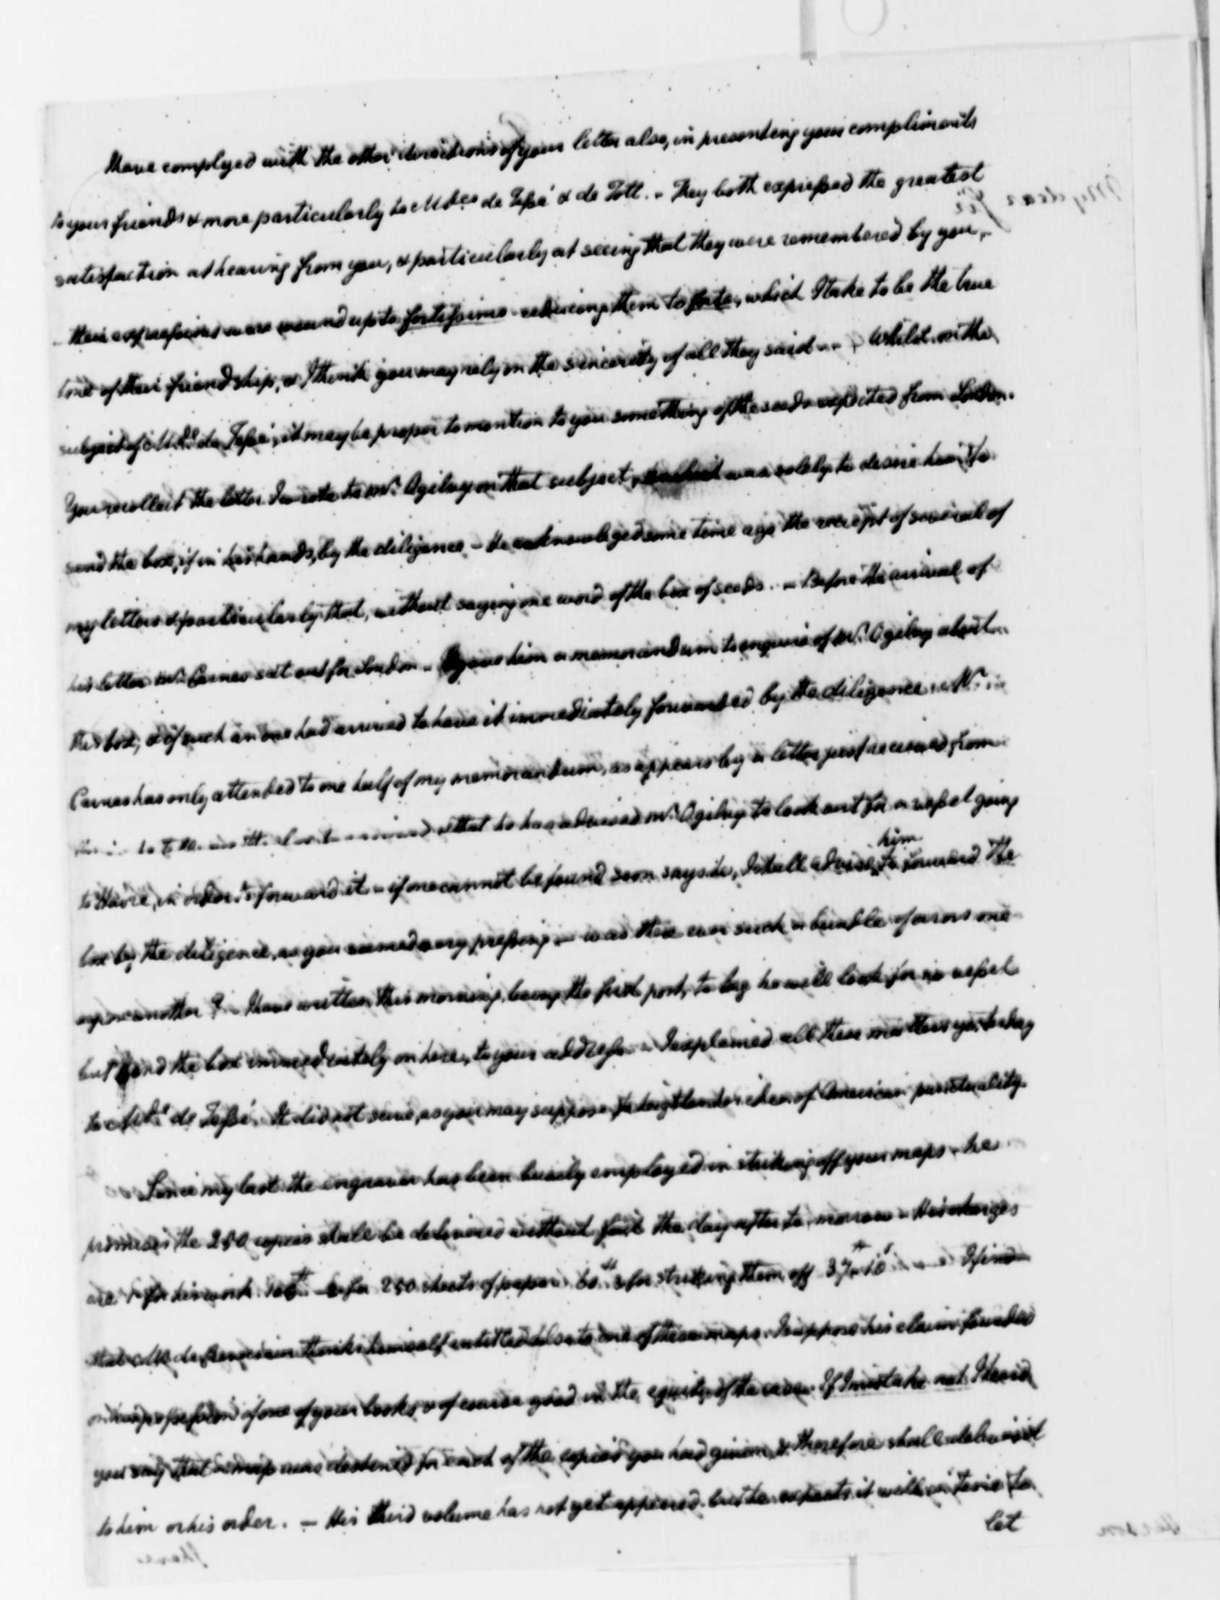 William Short to Thomas Jefferson, March 22, 1787